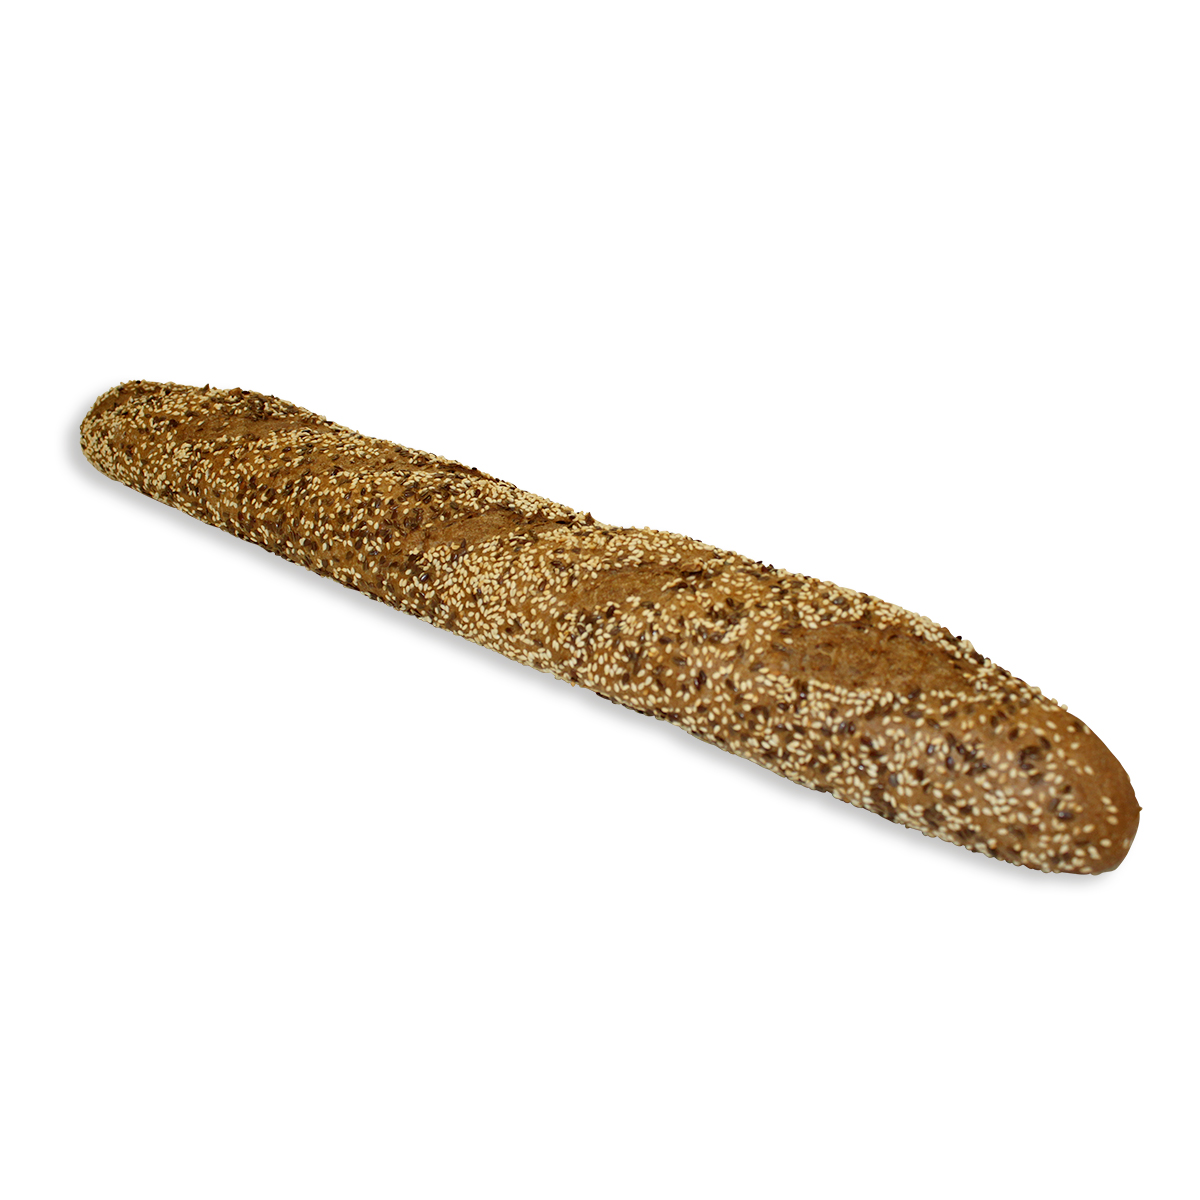 Desem stokbrood